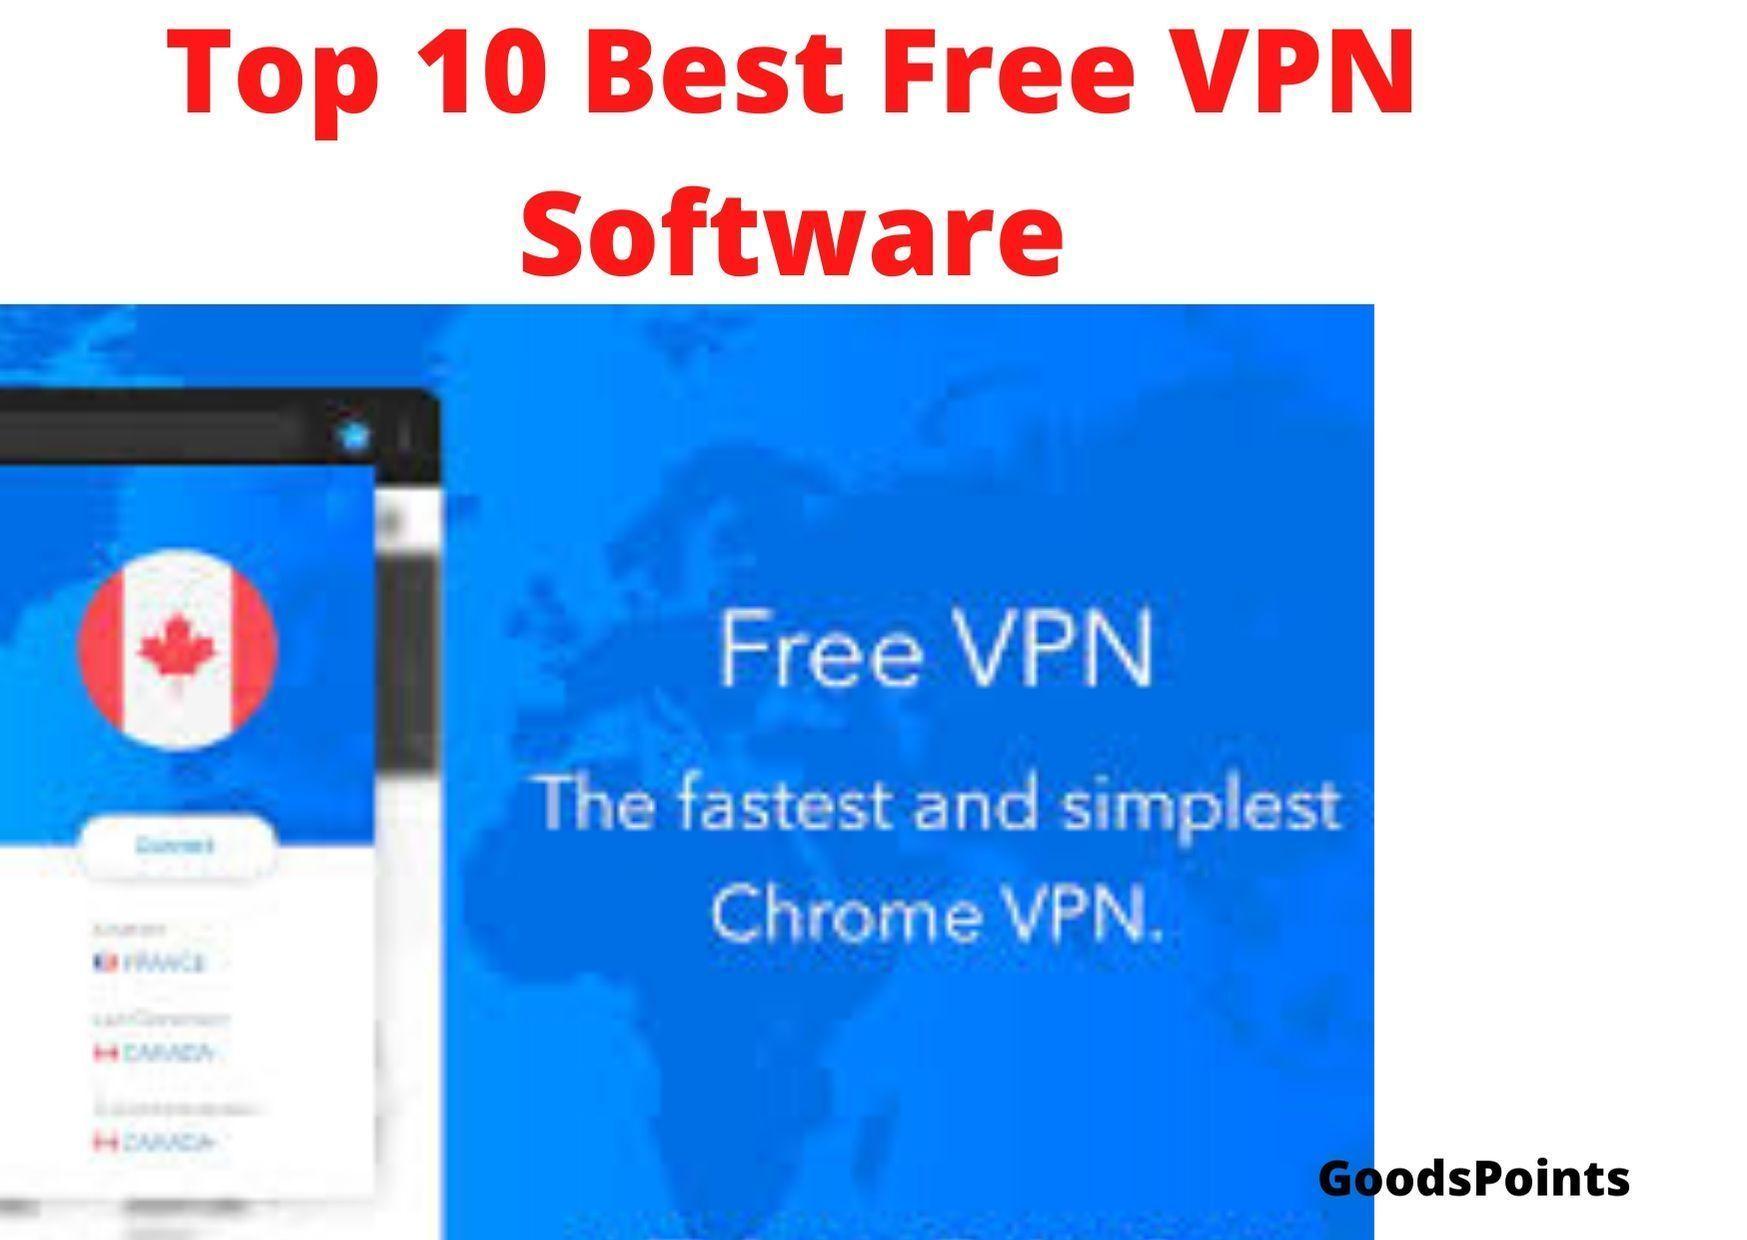 6ac2a9bd6ee9e4d732334a0ad63e86a7 - Best Vpn Client For Windows 10